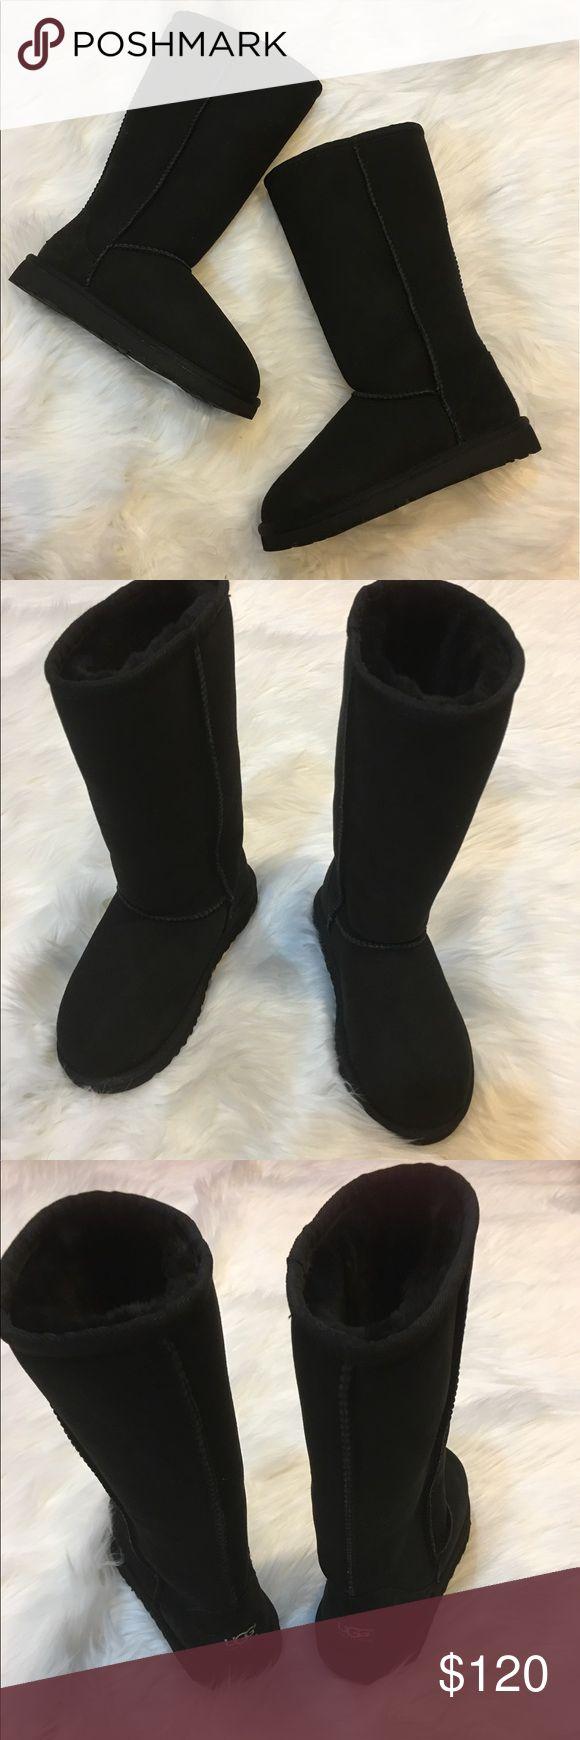 UGG Kids Classic Tall Sheepskin Boot size 13 New without box UGG classic tall boot. Kids size 13 UGG Shoes Boots